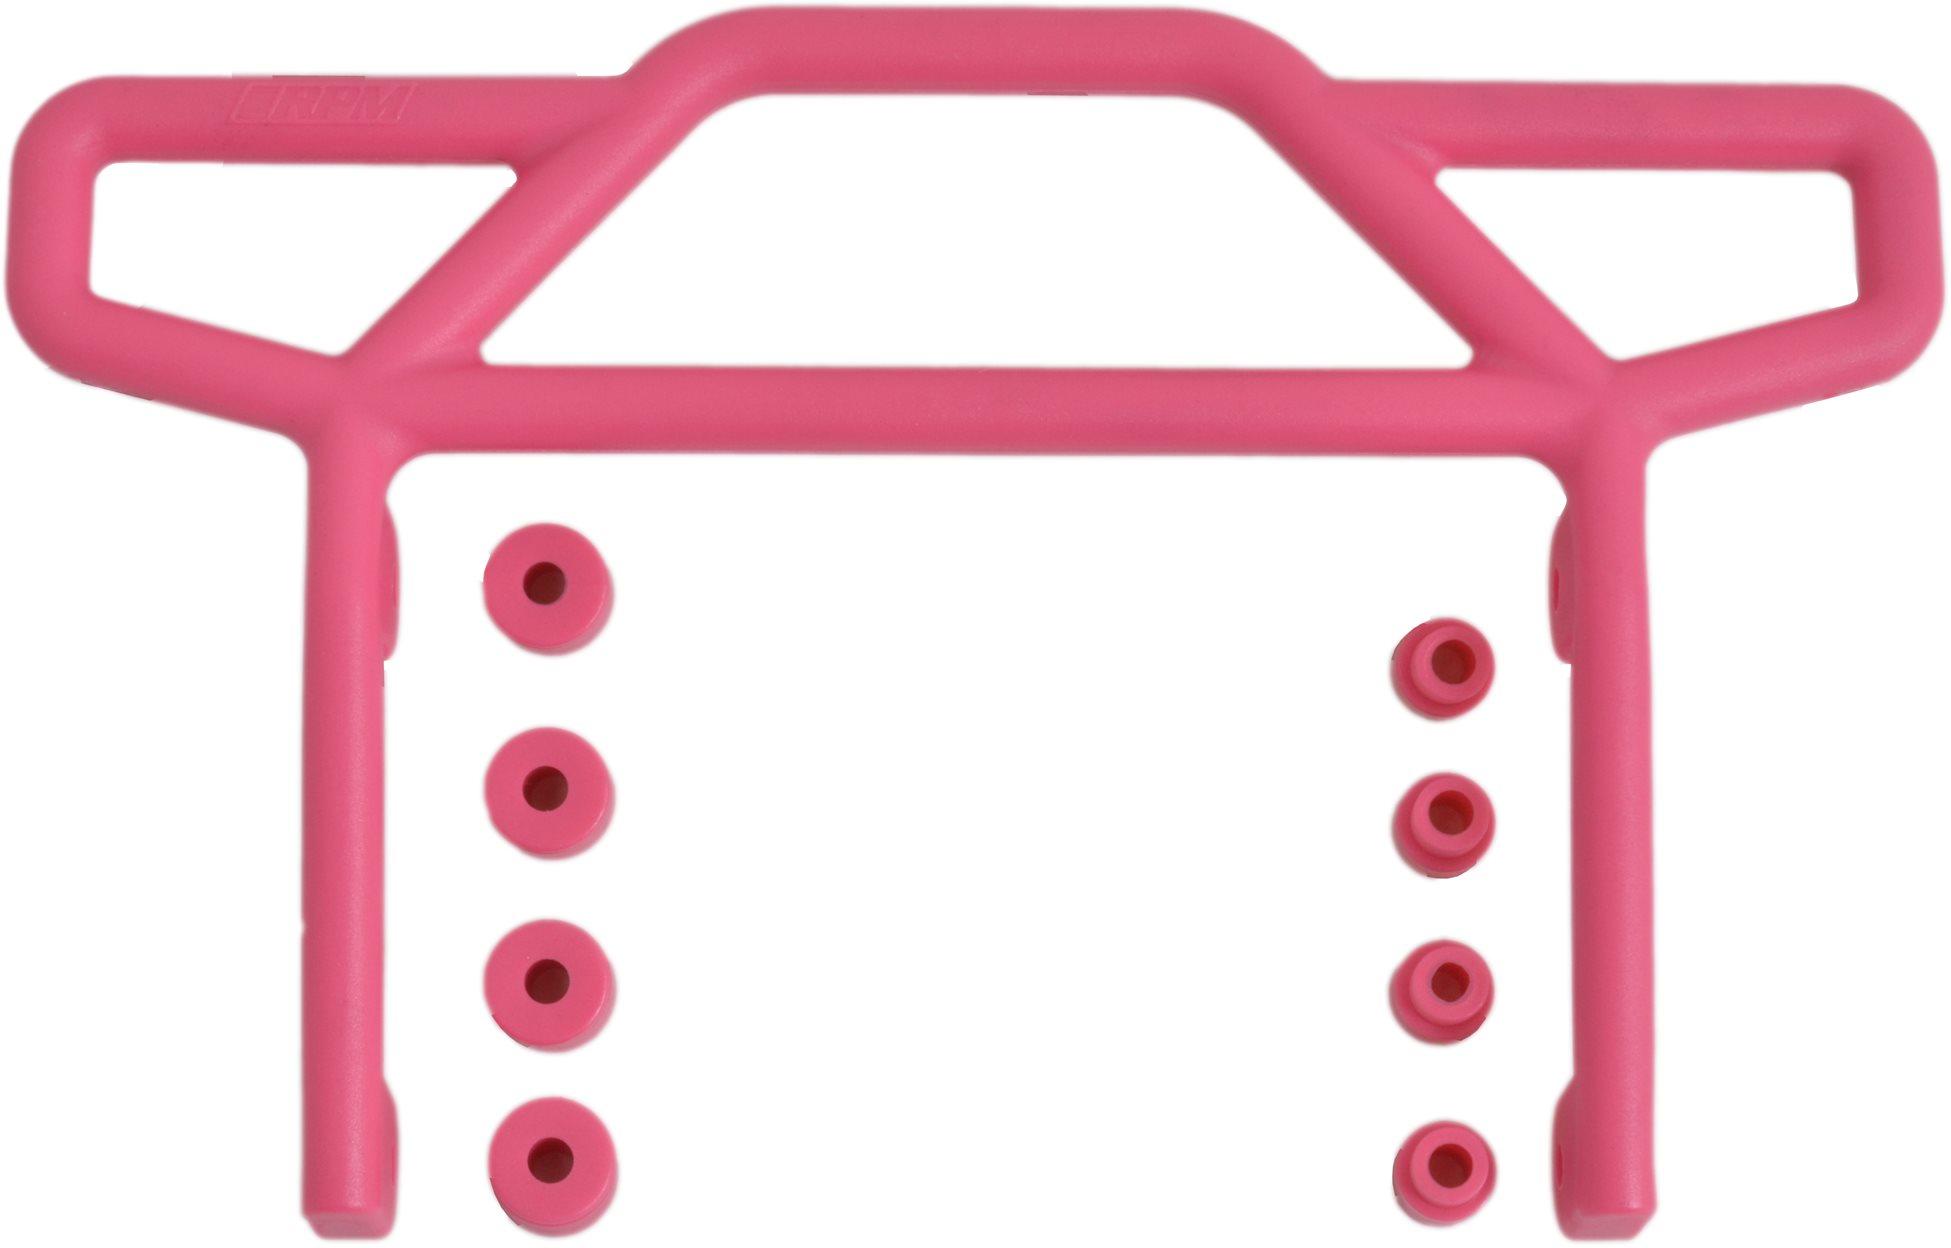 RPM Rear Bumper, Pink, For Traxxas Electric Rustler